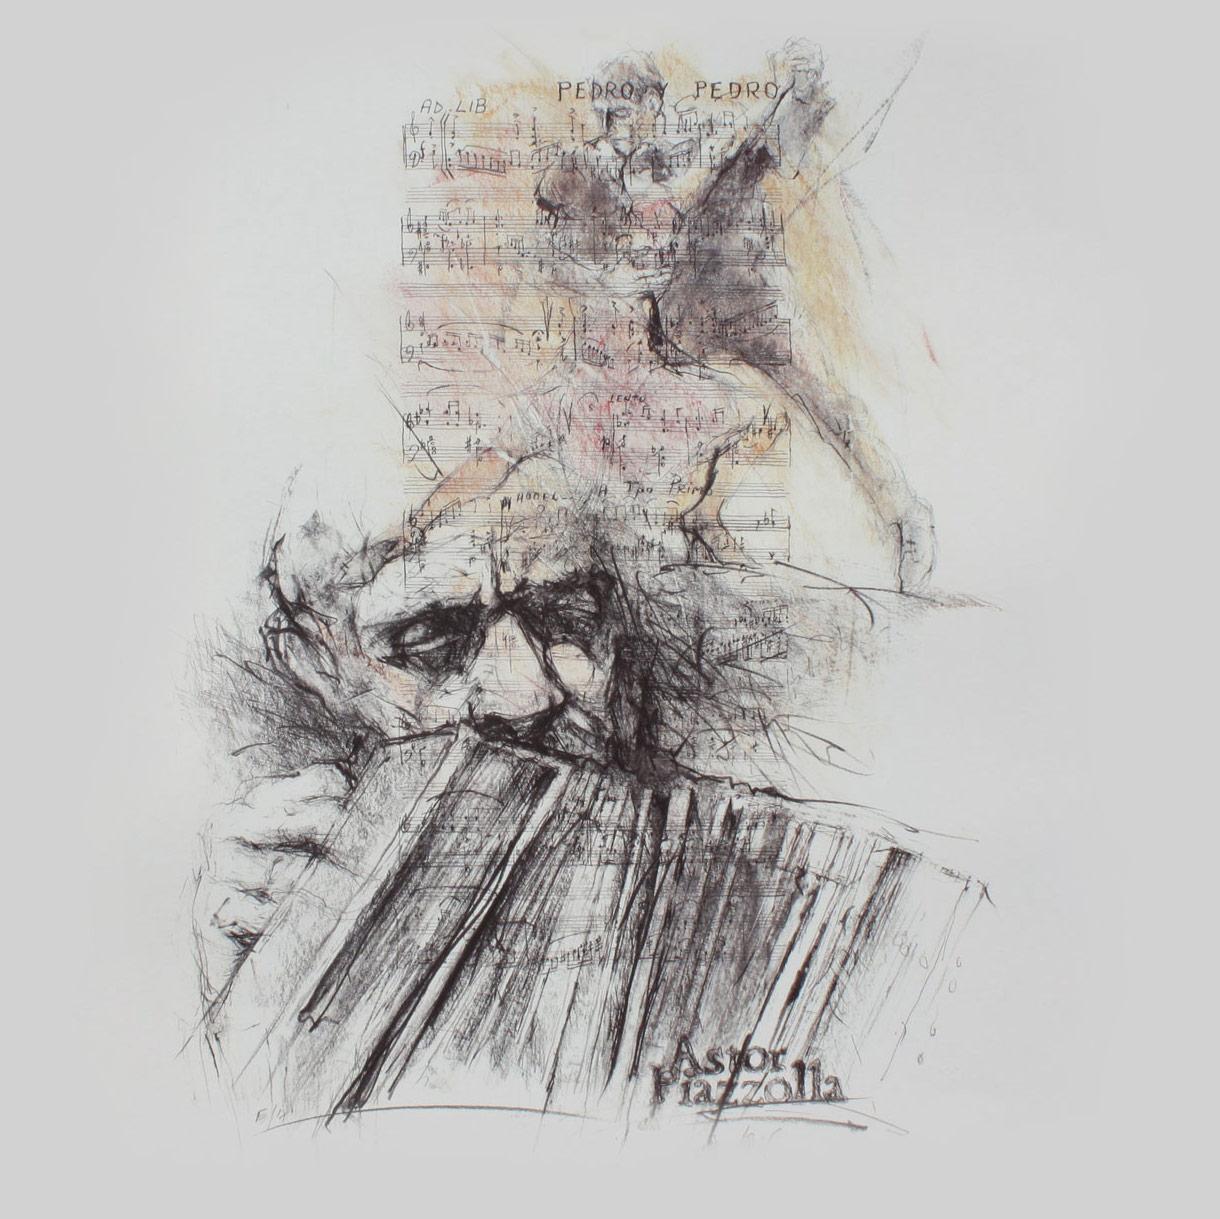 Astor Piazzolla by Hetty Krist